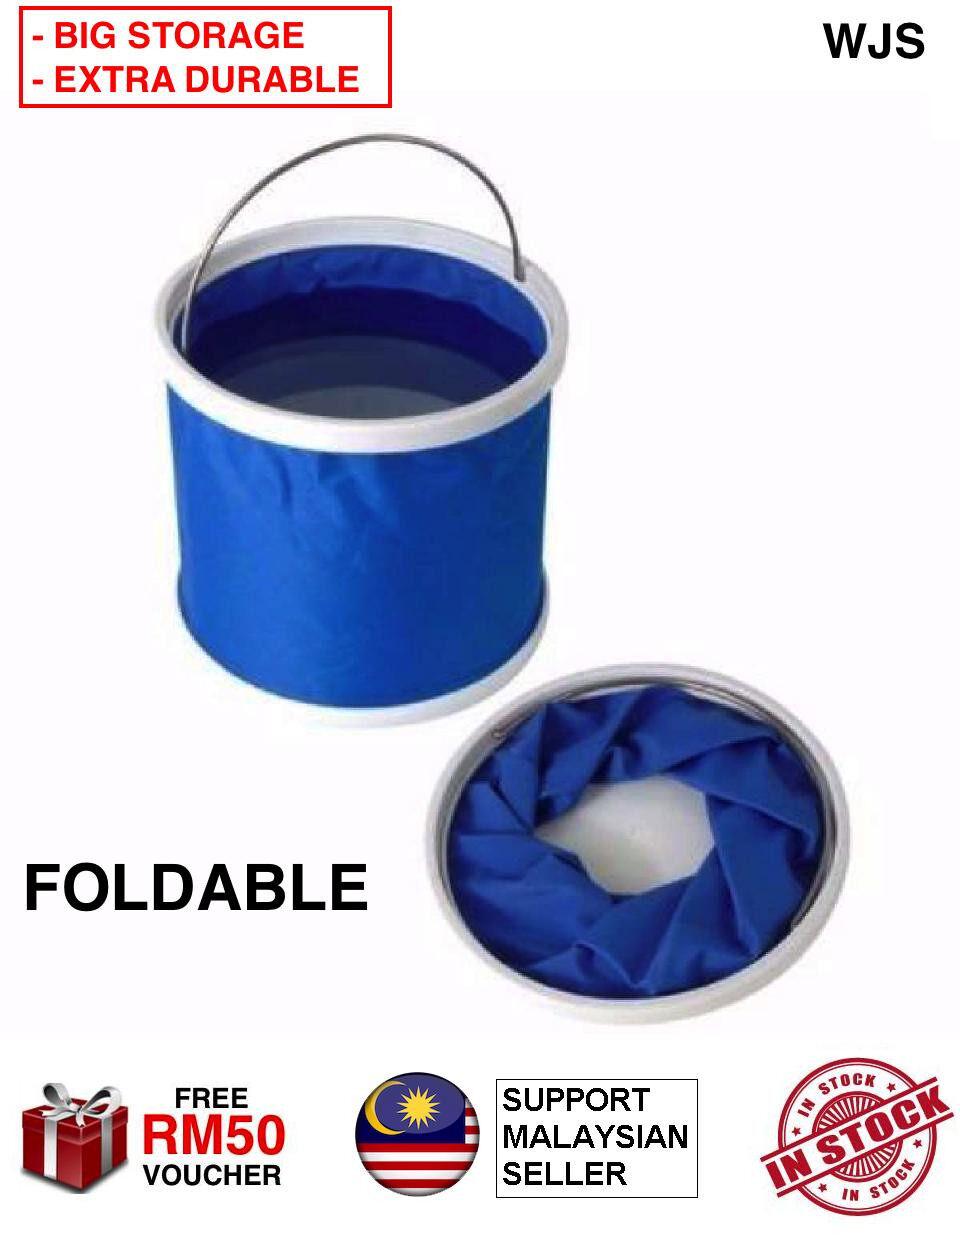 (BIG STORAGE + DURABLE) WJS Foldable Foldable Water Bucket Car Wash Water Pail Fishing Camping Bucket Water Bucket Baldi Air Boleh Dilipat Fishing Pail Baldi Pancing Ikan 11.6L 1160ml BLUE [FREE RM 50 VOUCHER]